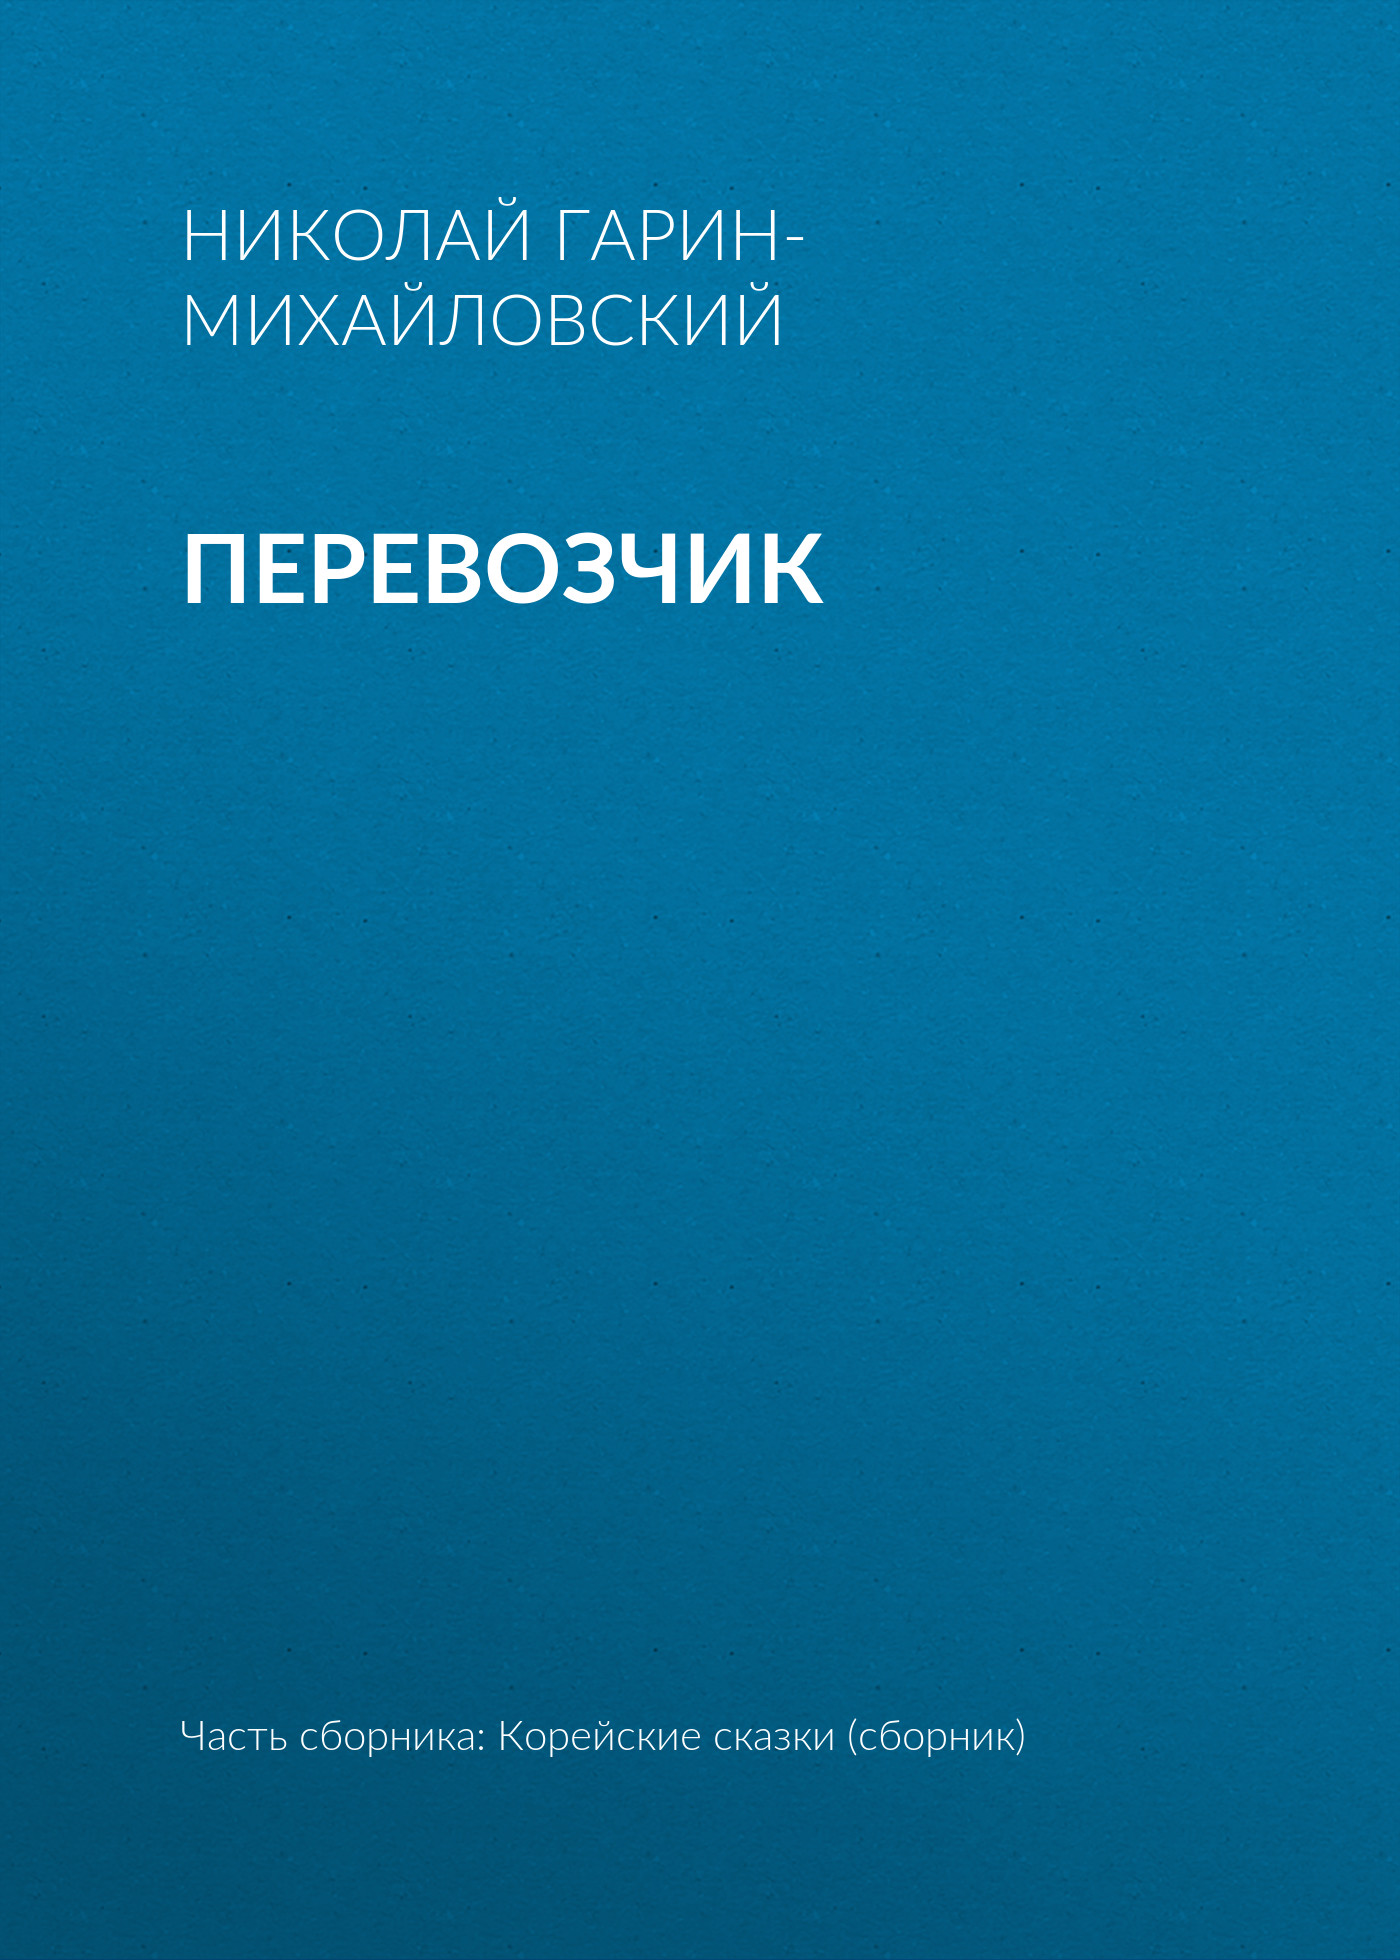 Николай Гарин-Михайловский Перевозчик цена